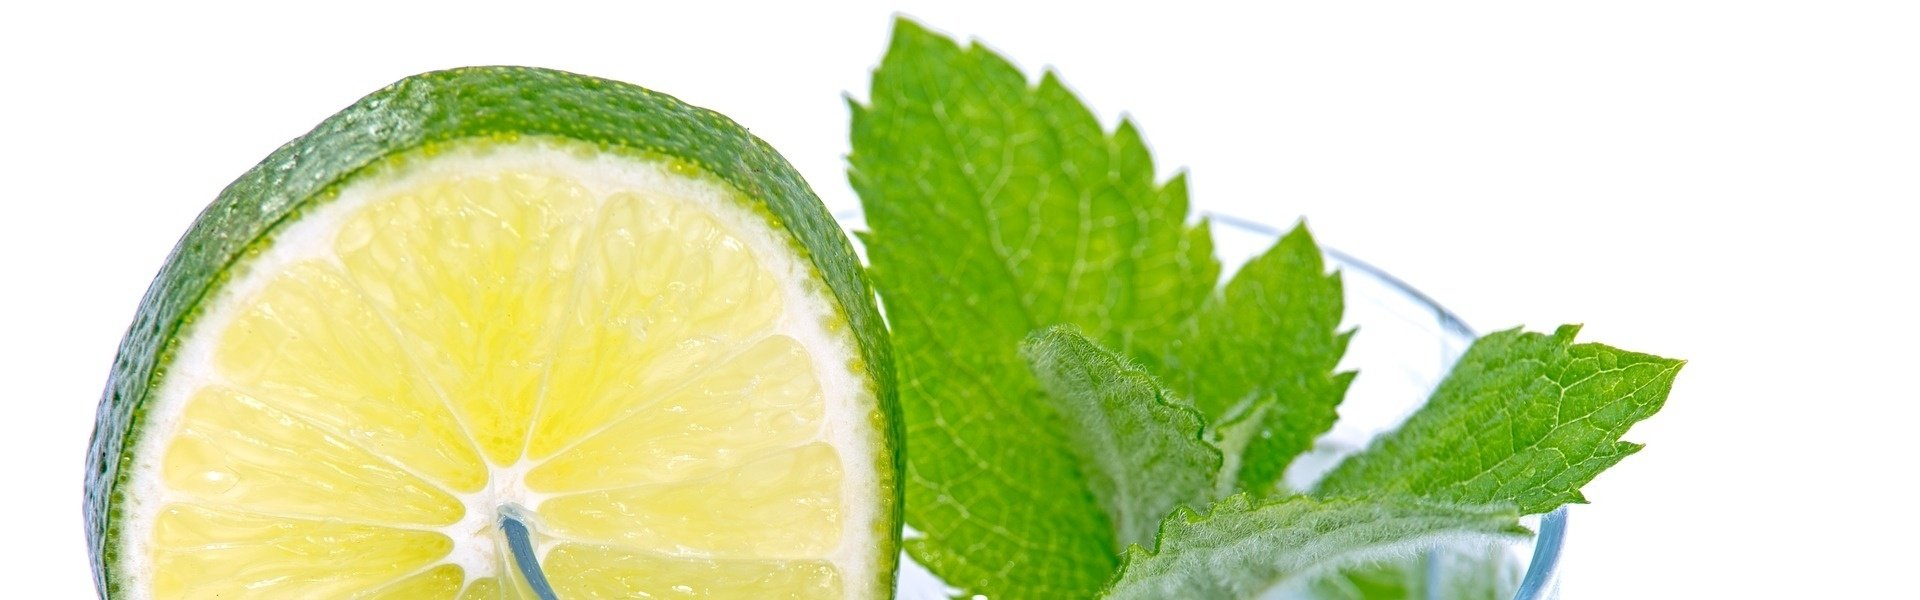 Lenti-Lendava Lime-Limonade